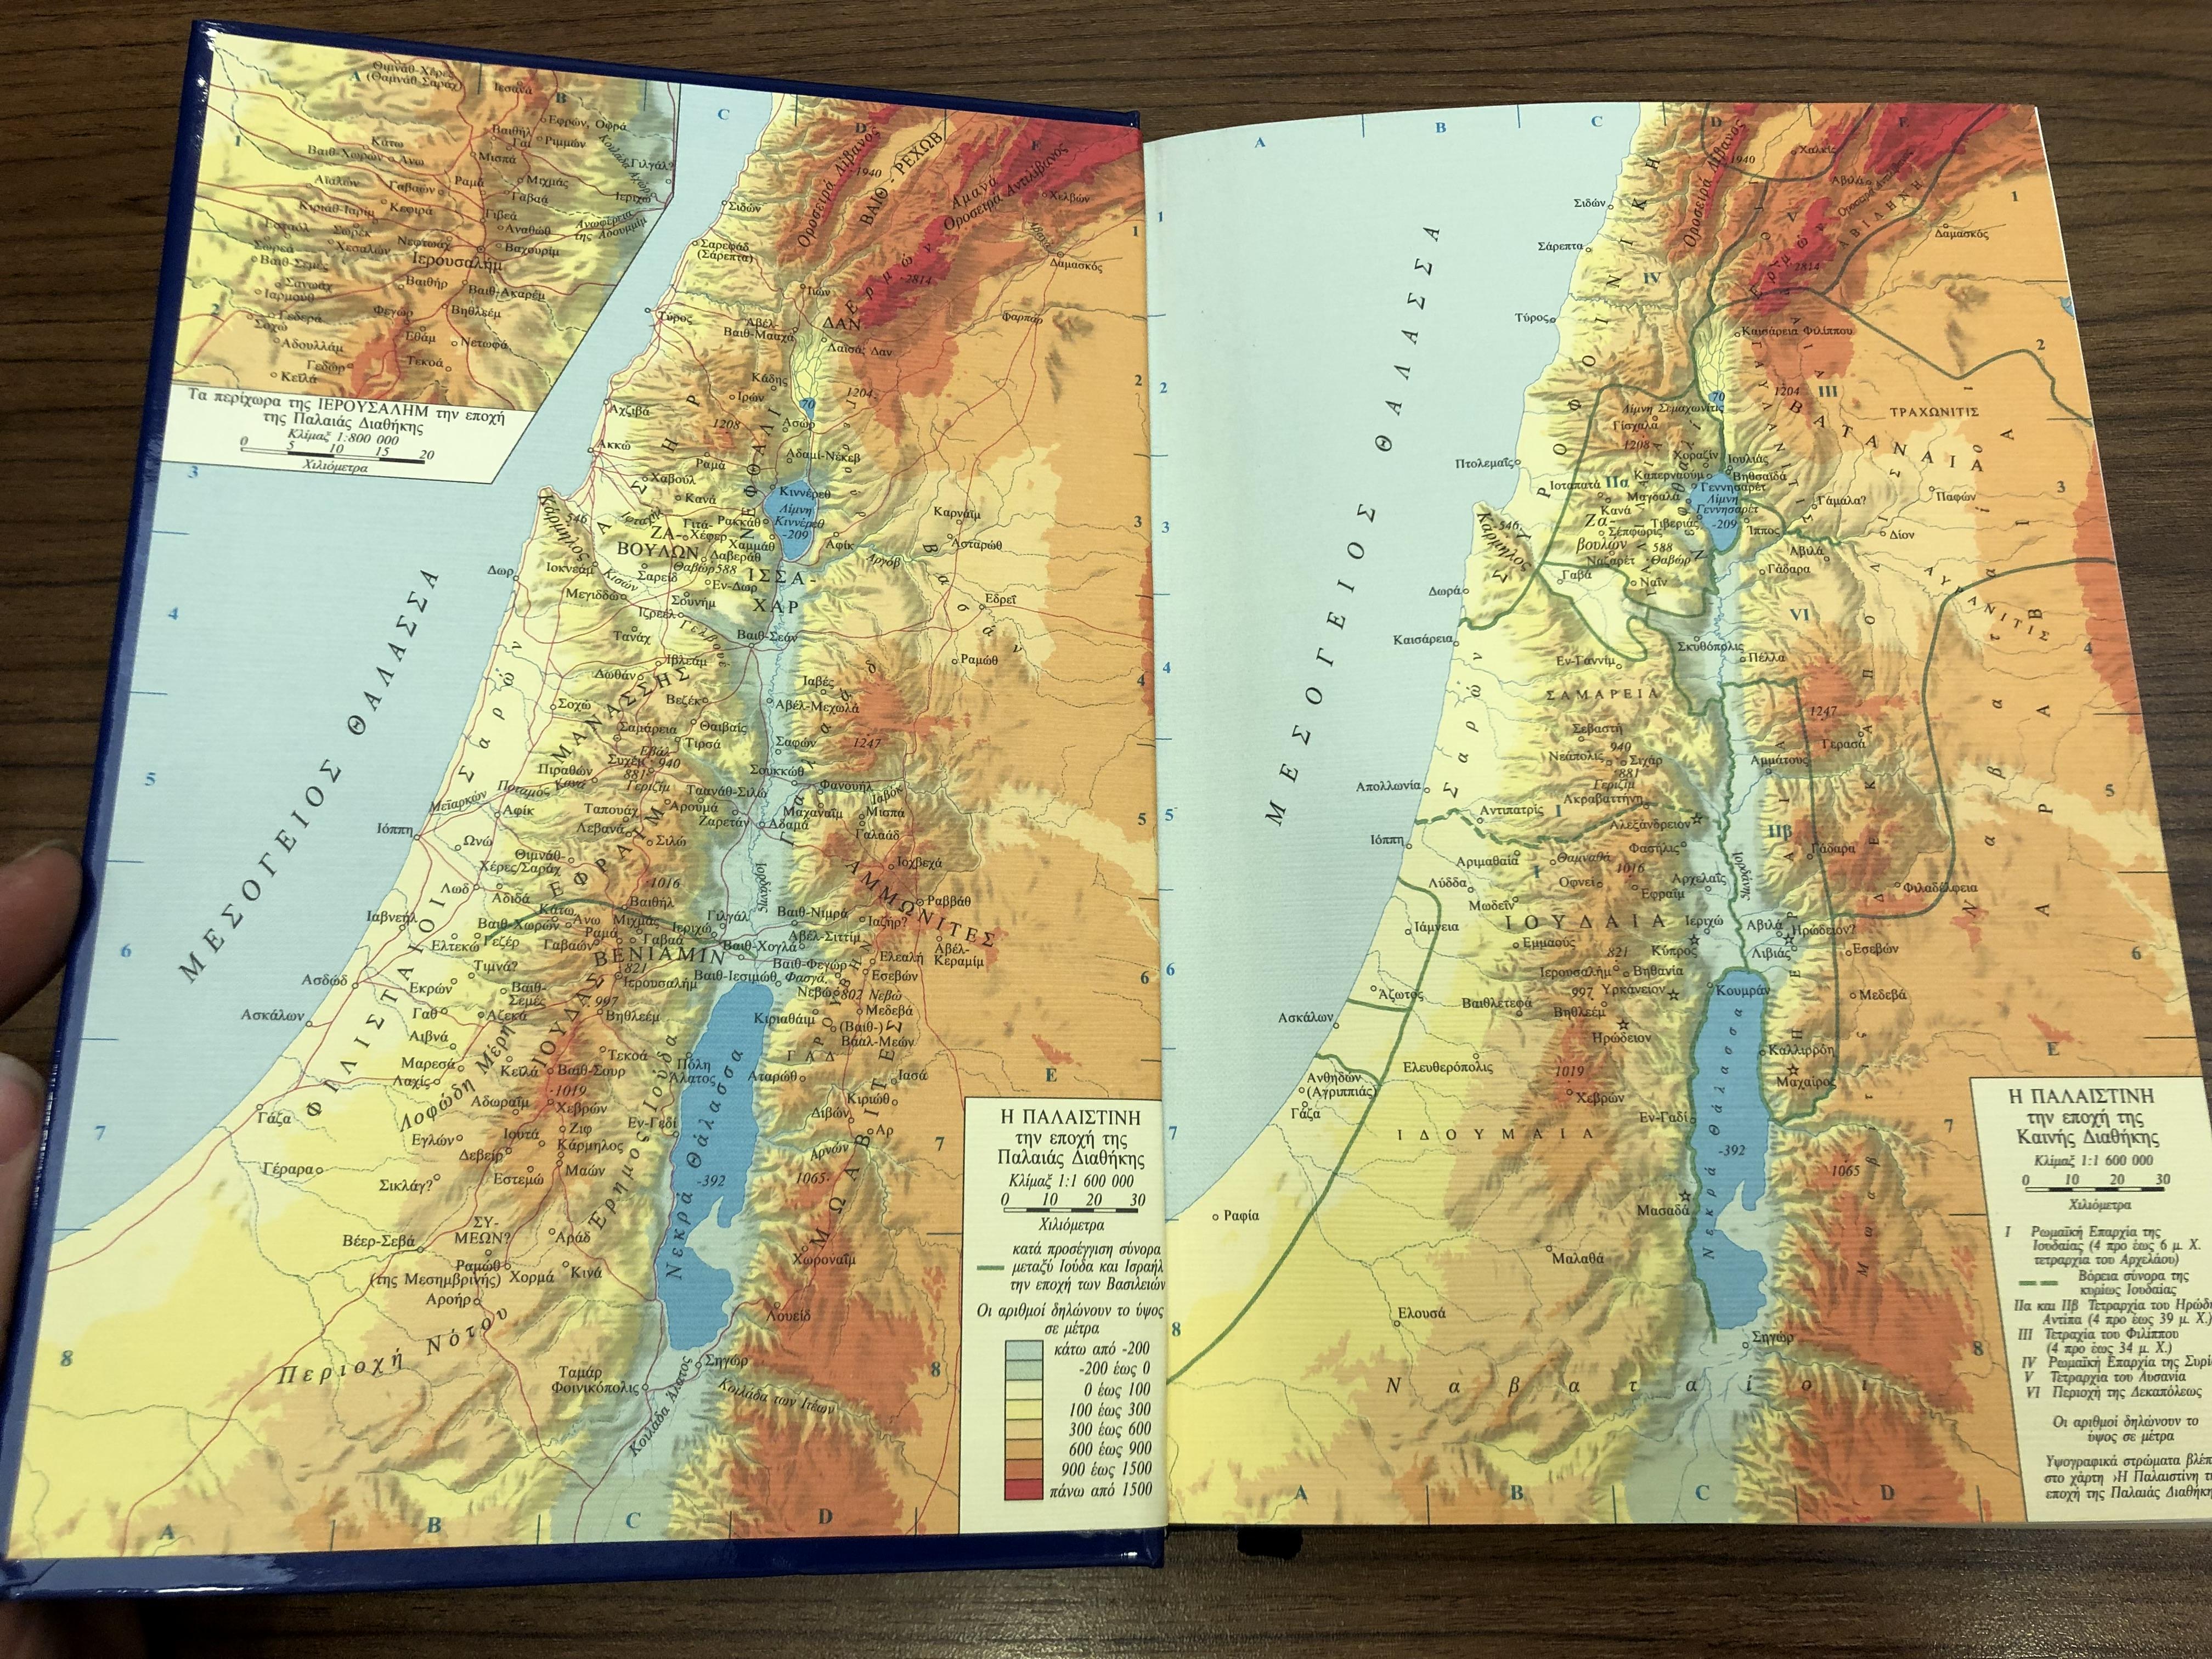 -the-holy-bible-in-today-s-greek-w-deuterocanonicals-7-.jpg